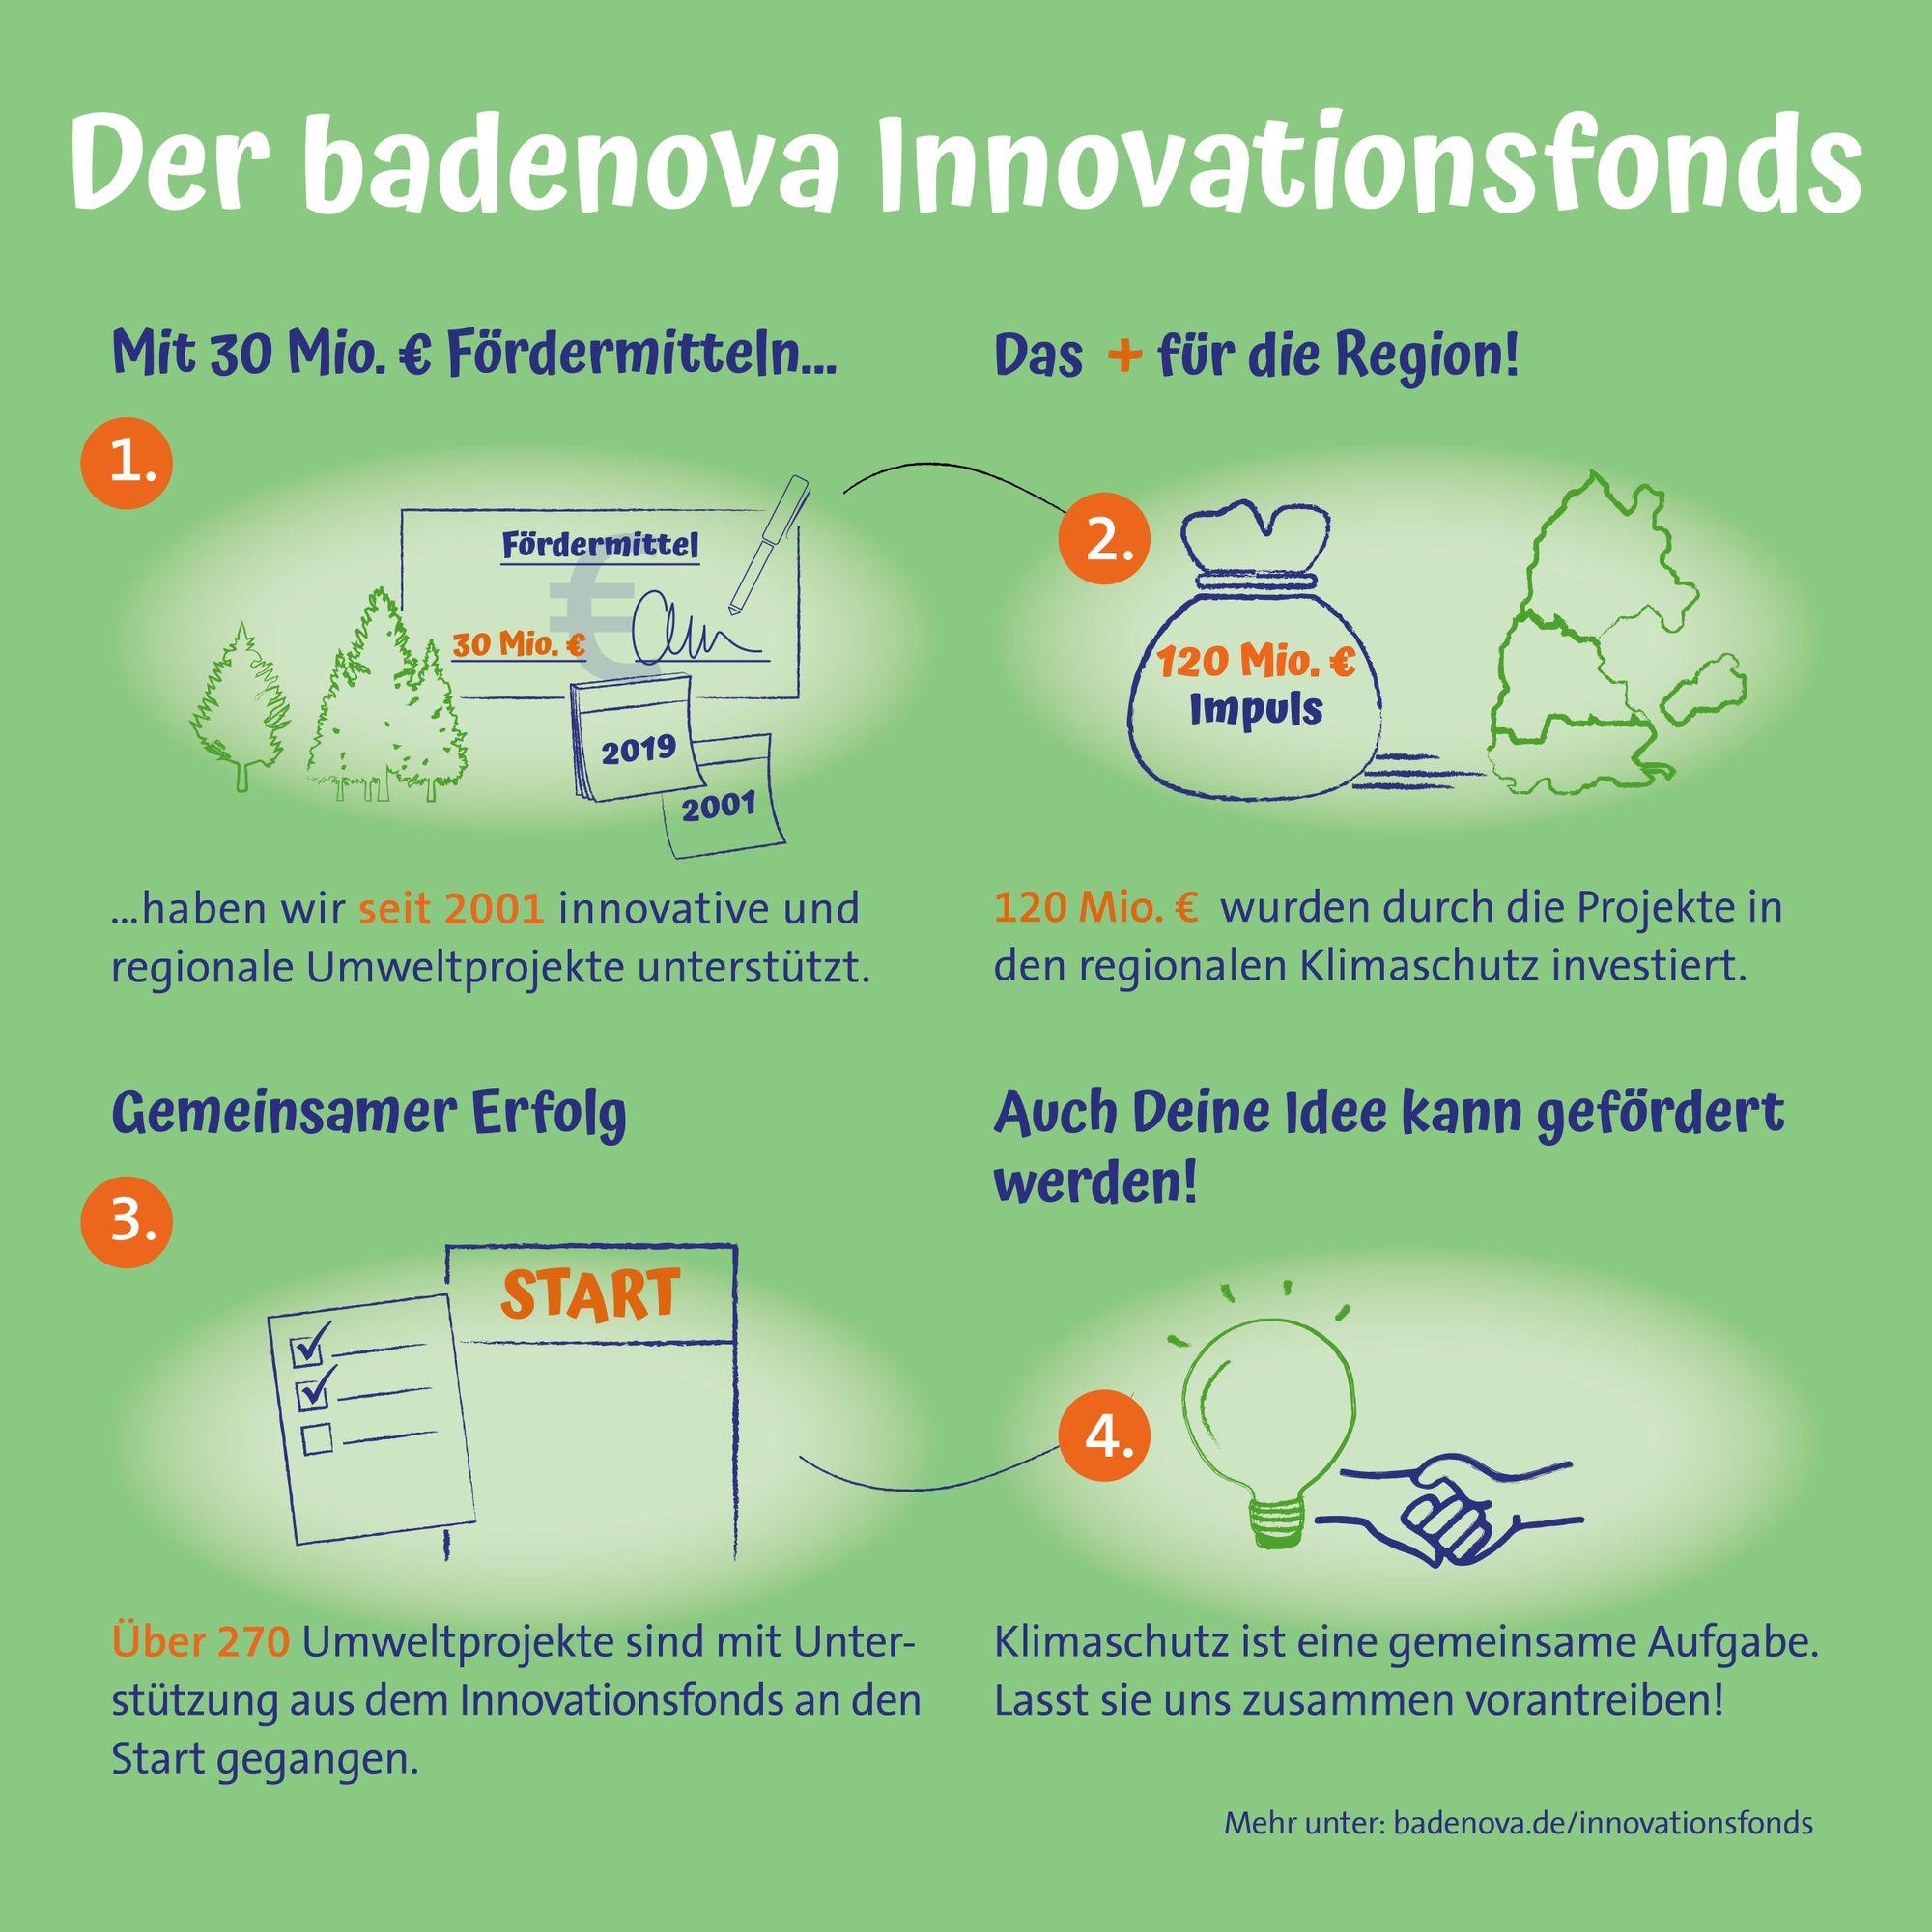 Mit dem badenova Innovationsfonds fördert badenova jährlich Umweltprojekte mit über 1,5 Millionen Euro